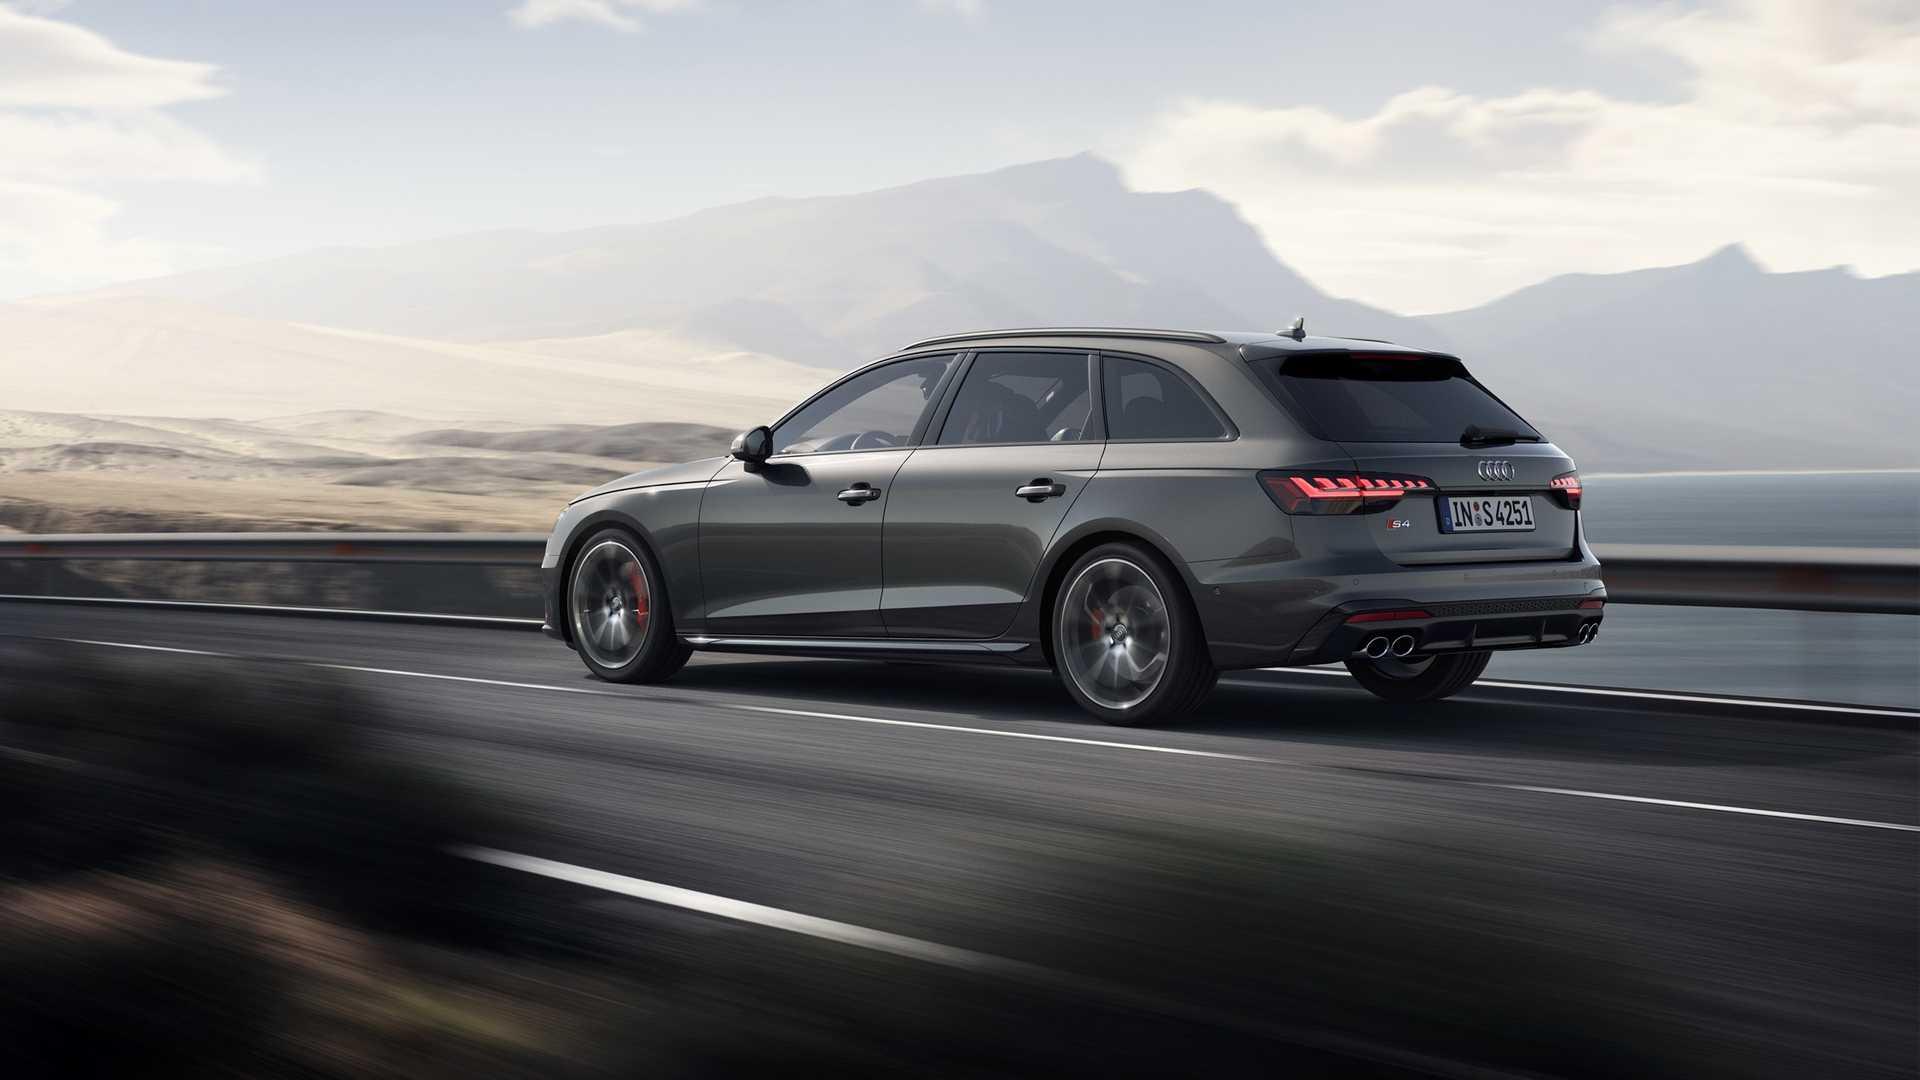 2020 Audi S4 Avant TDI (Color: Daytona Gray) Rear Three-Quarter Wallpapers (2)